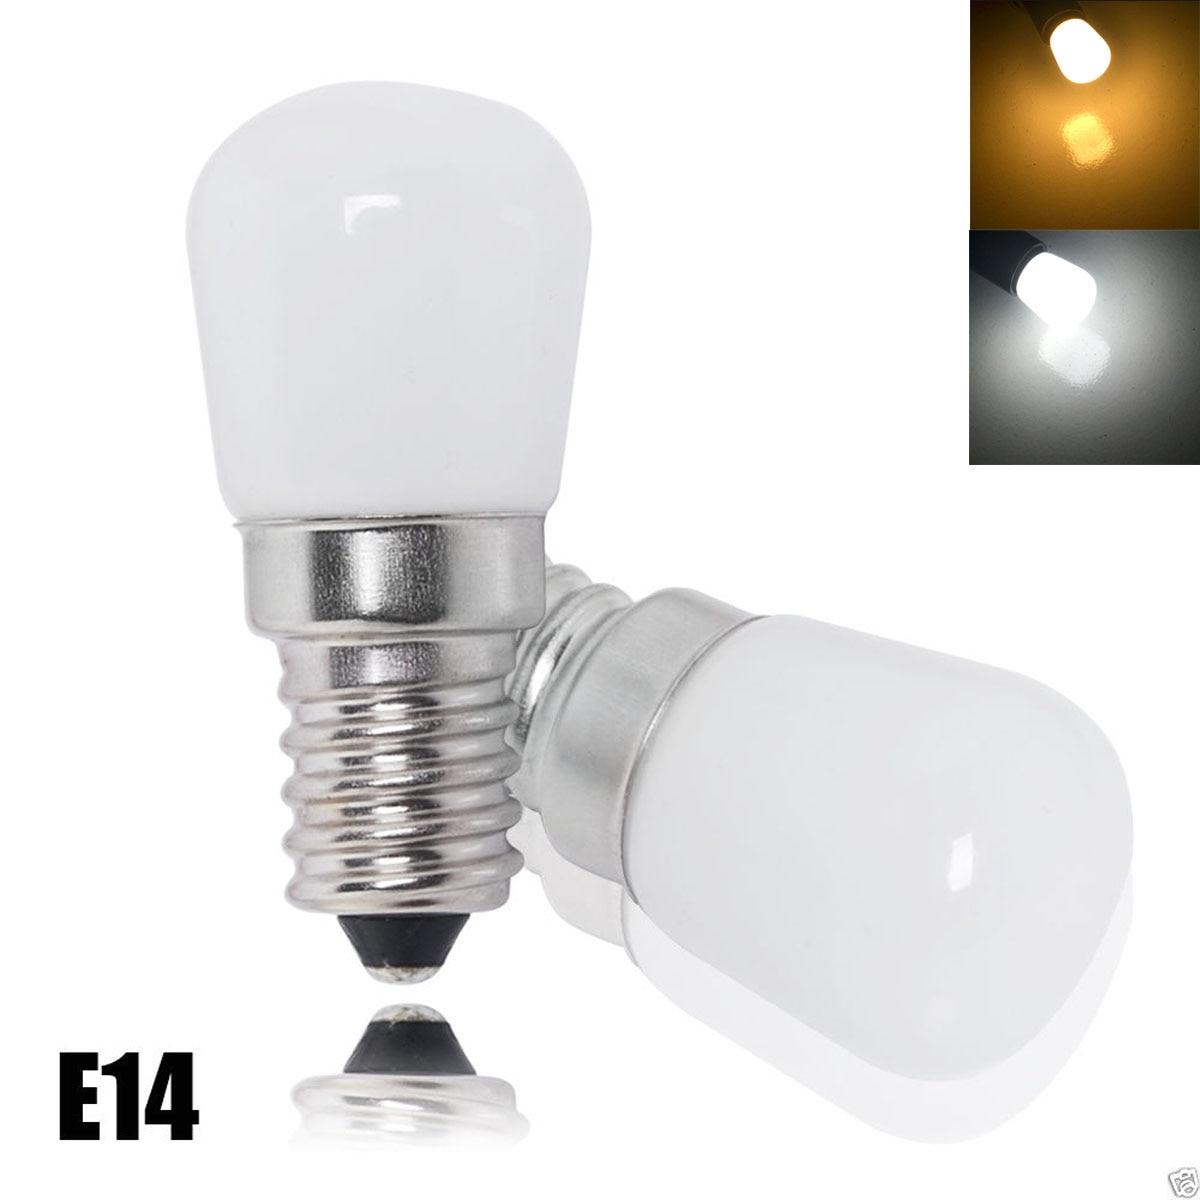 Jiawen 100 unids/lote refrigerador luz Led mini bombilla 220 V lámpara brillante para nevera congelador lámparas de araña de cristal iluminación